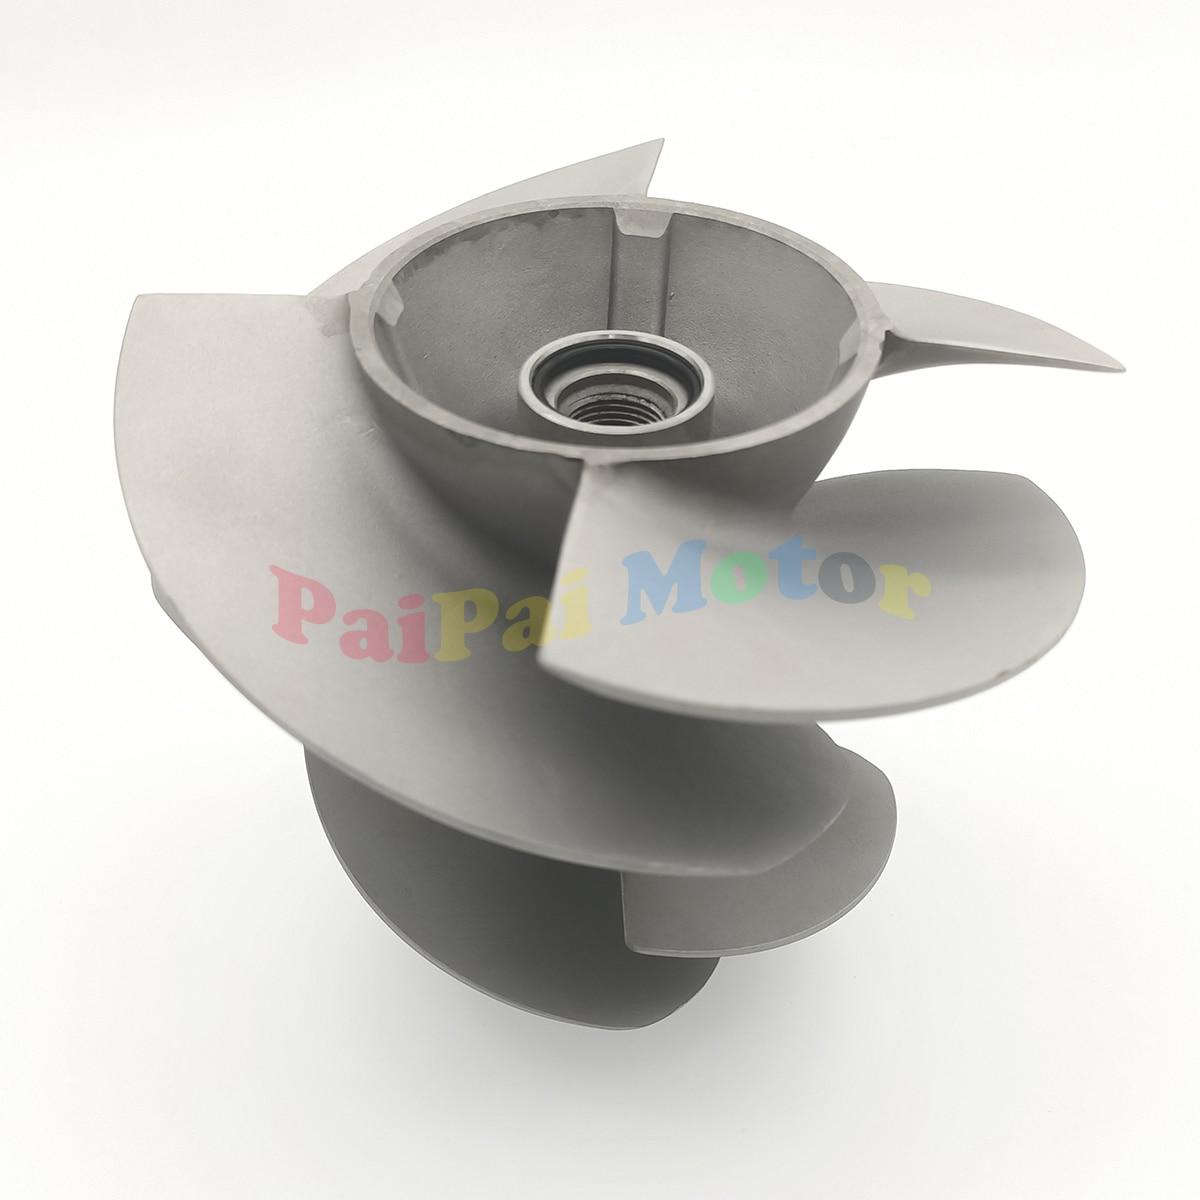 Sea-Doo seadoo BRP High Performance Impeller GTX RXP X RXT X 300 1630 ACE propeller wheel enlarge